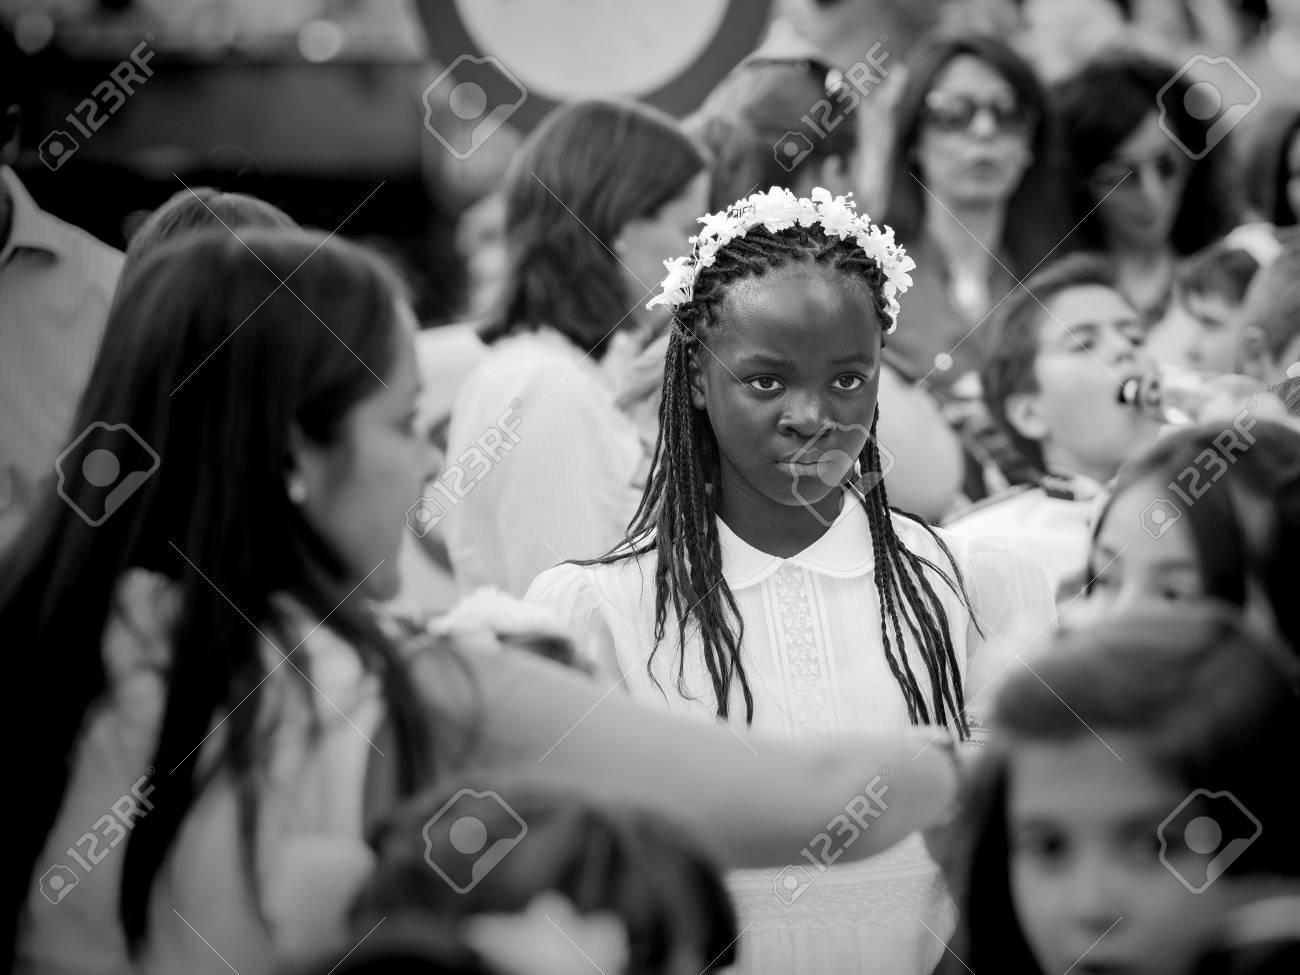 Madrid, Spain - June 07: Unidentified girl in catholic prosession on June 07, 2015 in Madrid, Spain. Standard-Bild - 89297226